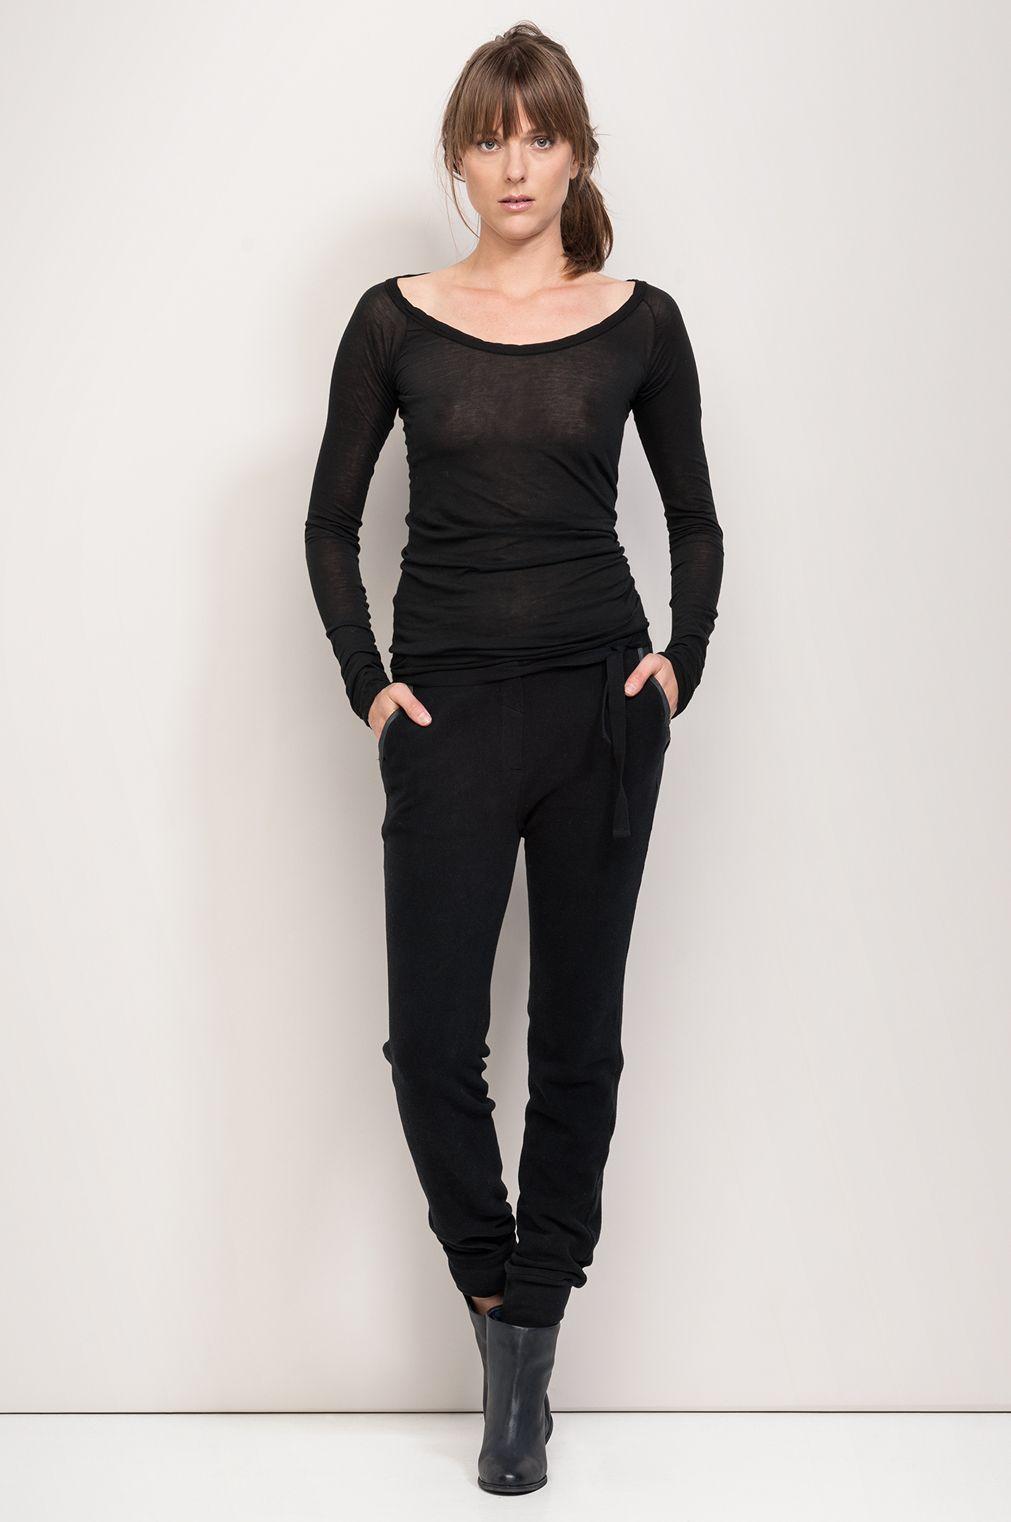 UNIV C AW14 › TEES › HUMANOID WEBSHOP | aw14 | Fashion ...